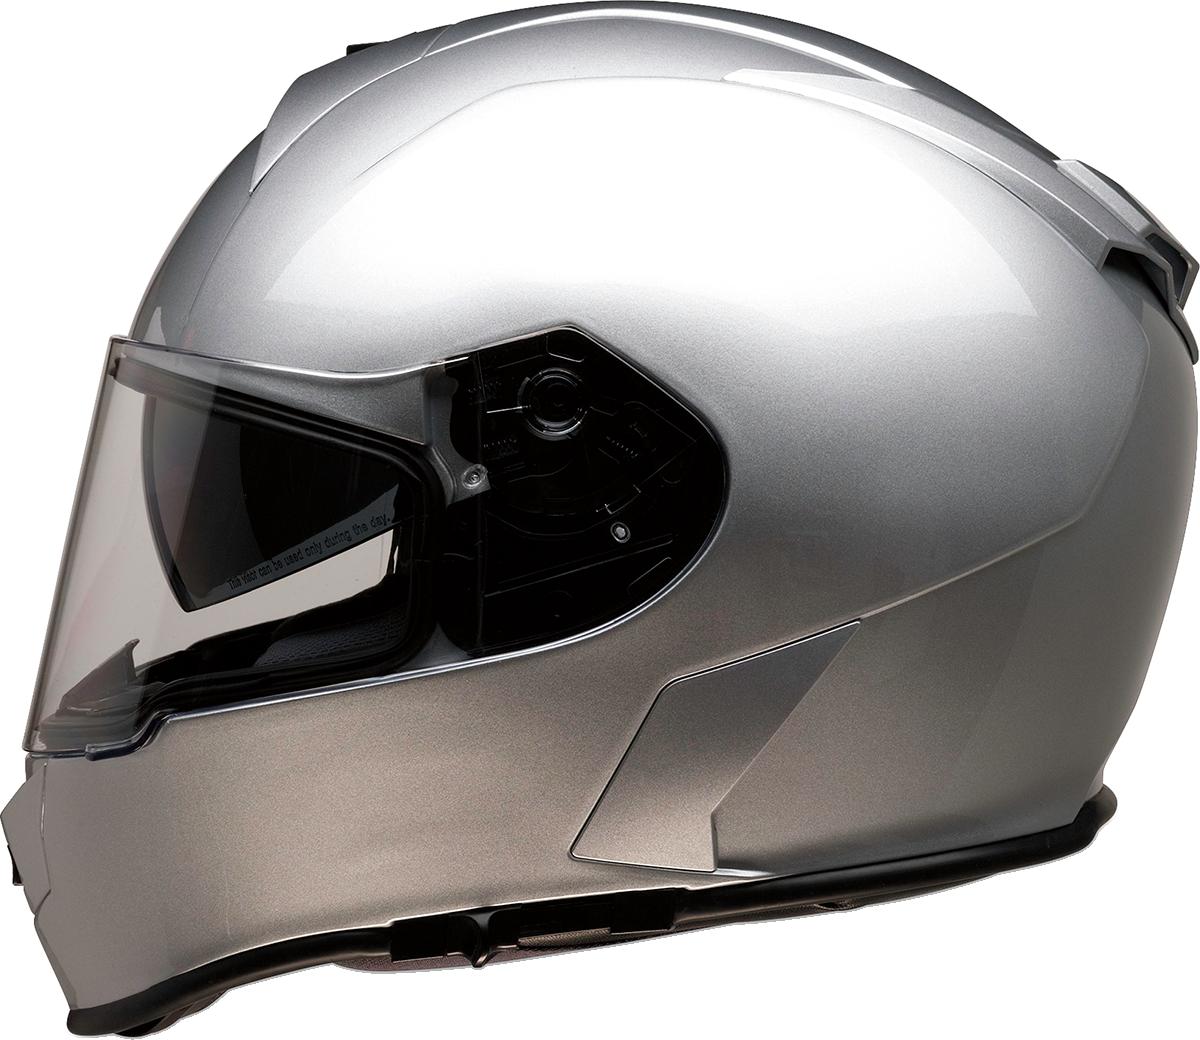 Z1R Warrant Unisex Silver Full Face Motorcycle Riding Street Racing Helmet